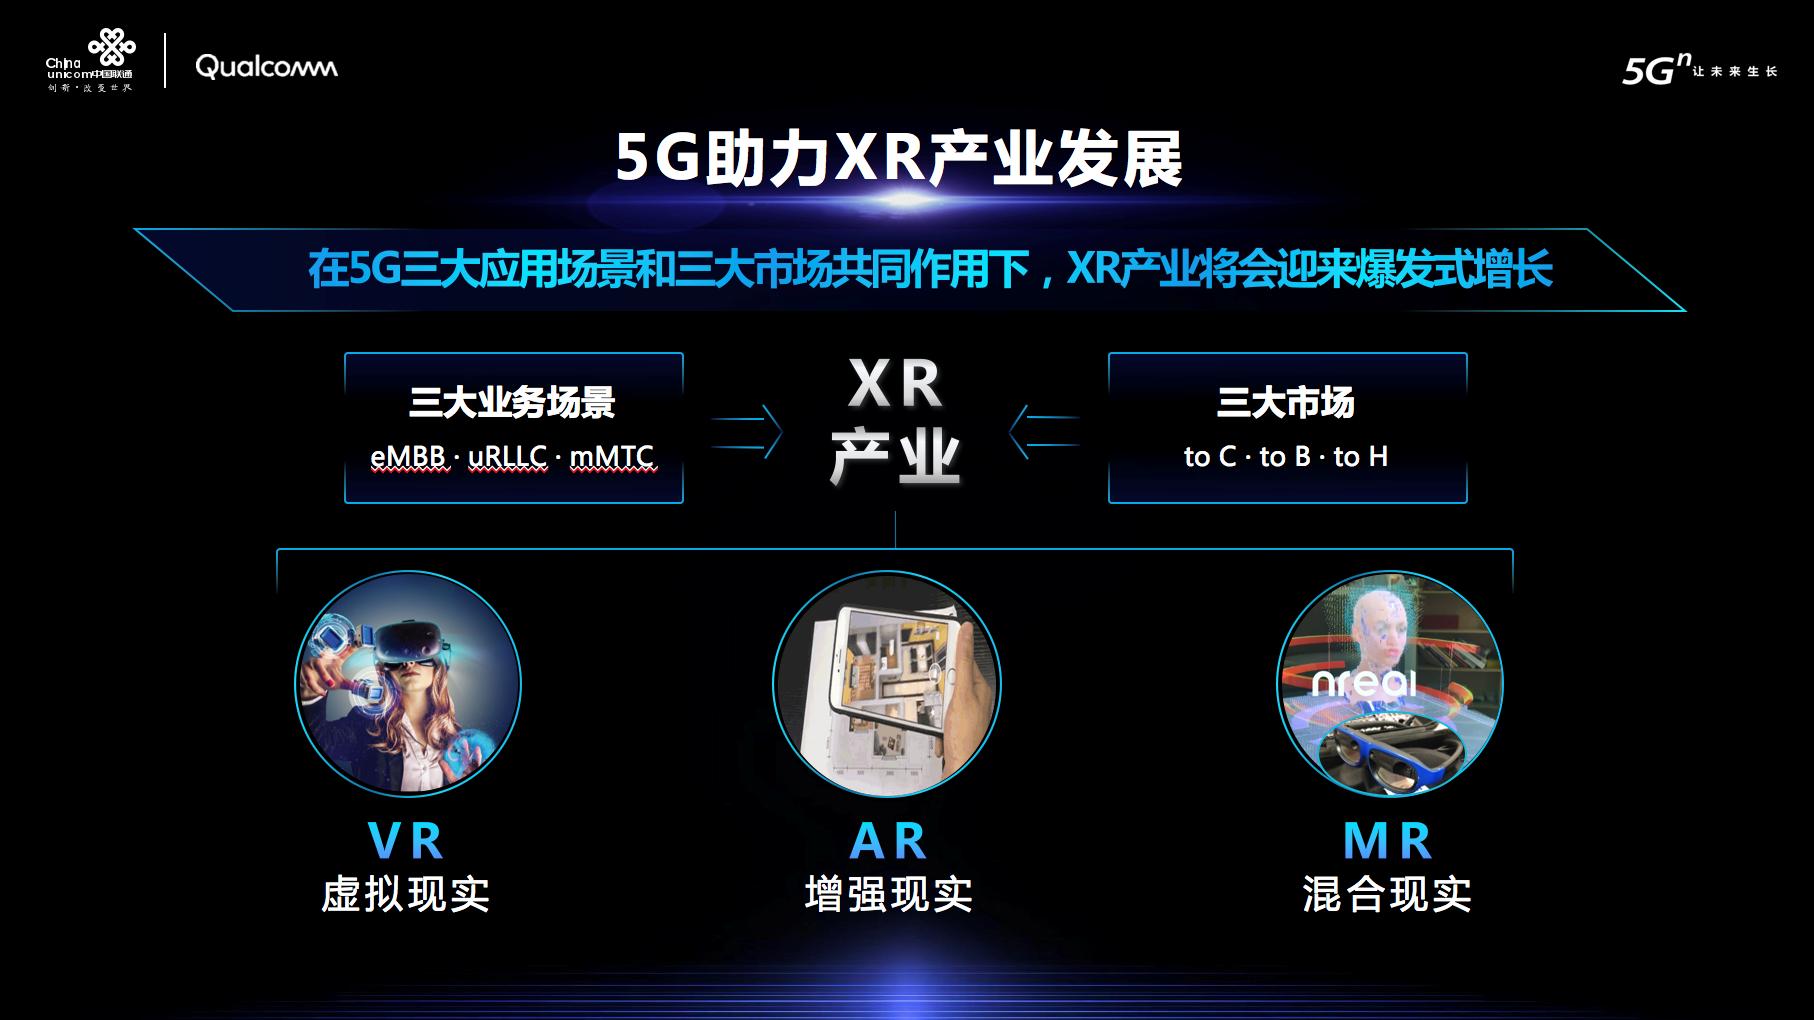 Nreal 携手中国联通布局 400 家 5G 体验中心XR展示试点